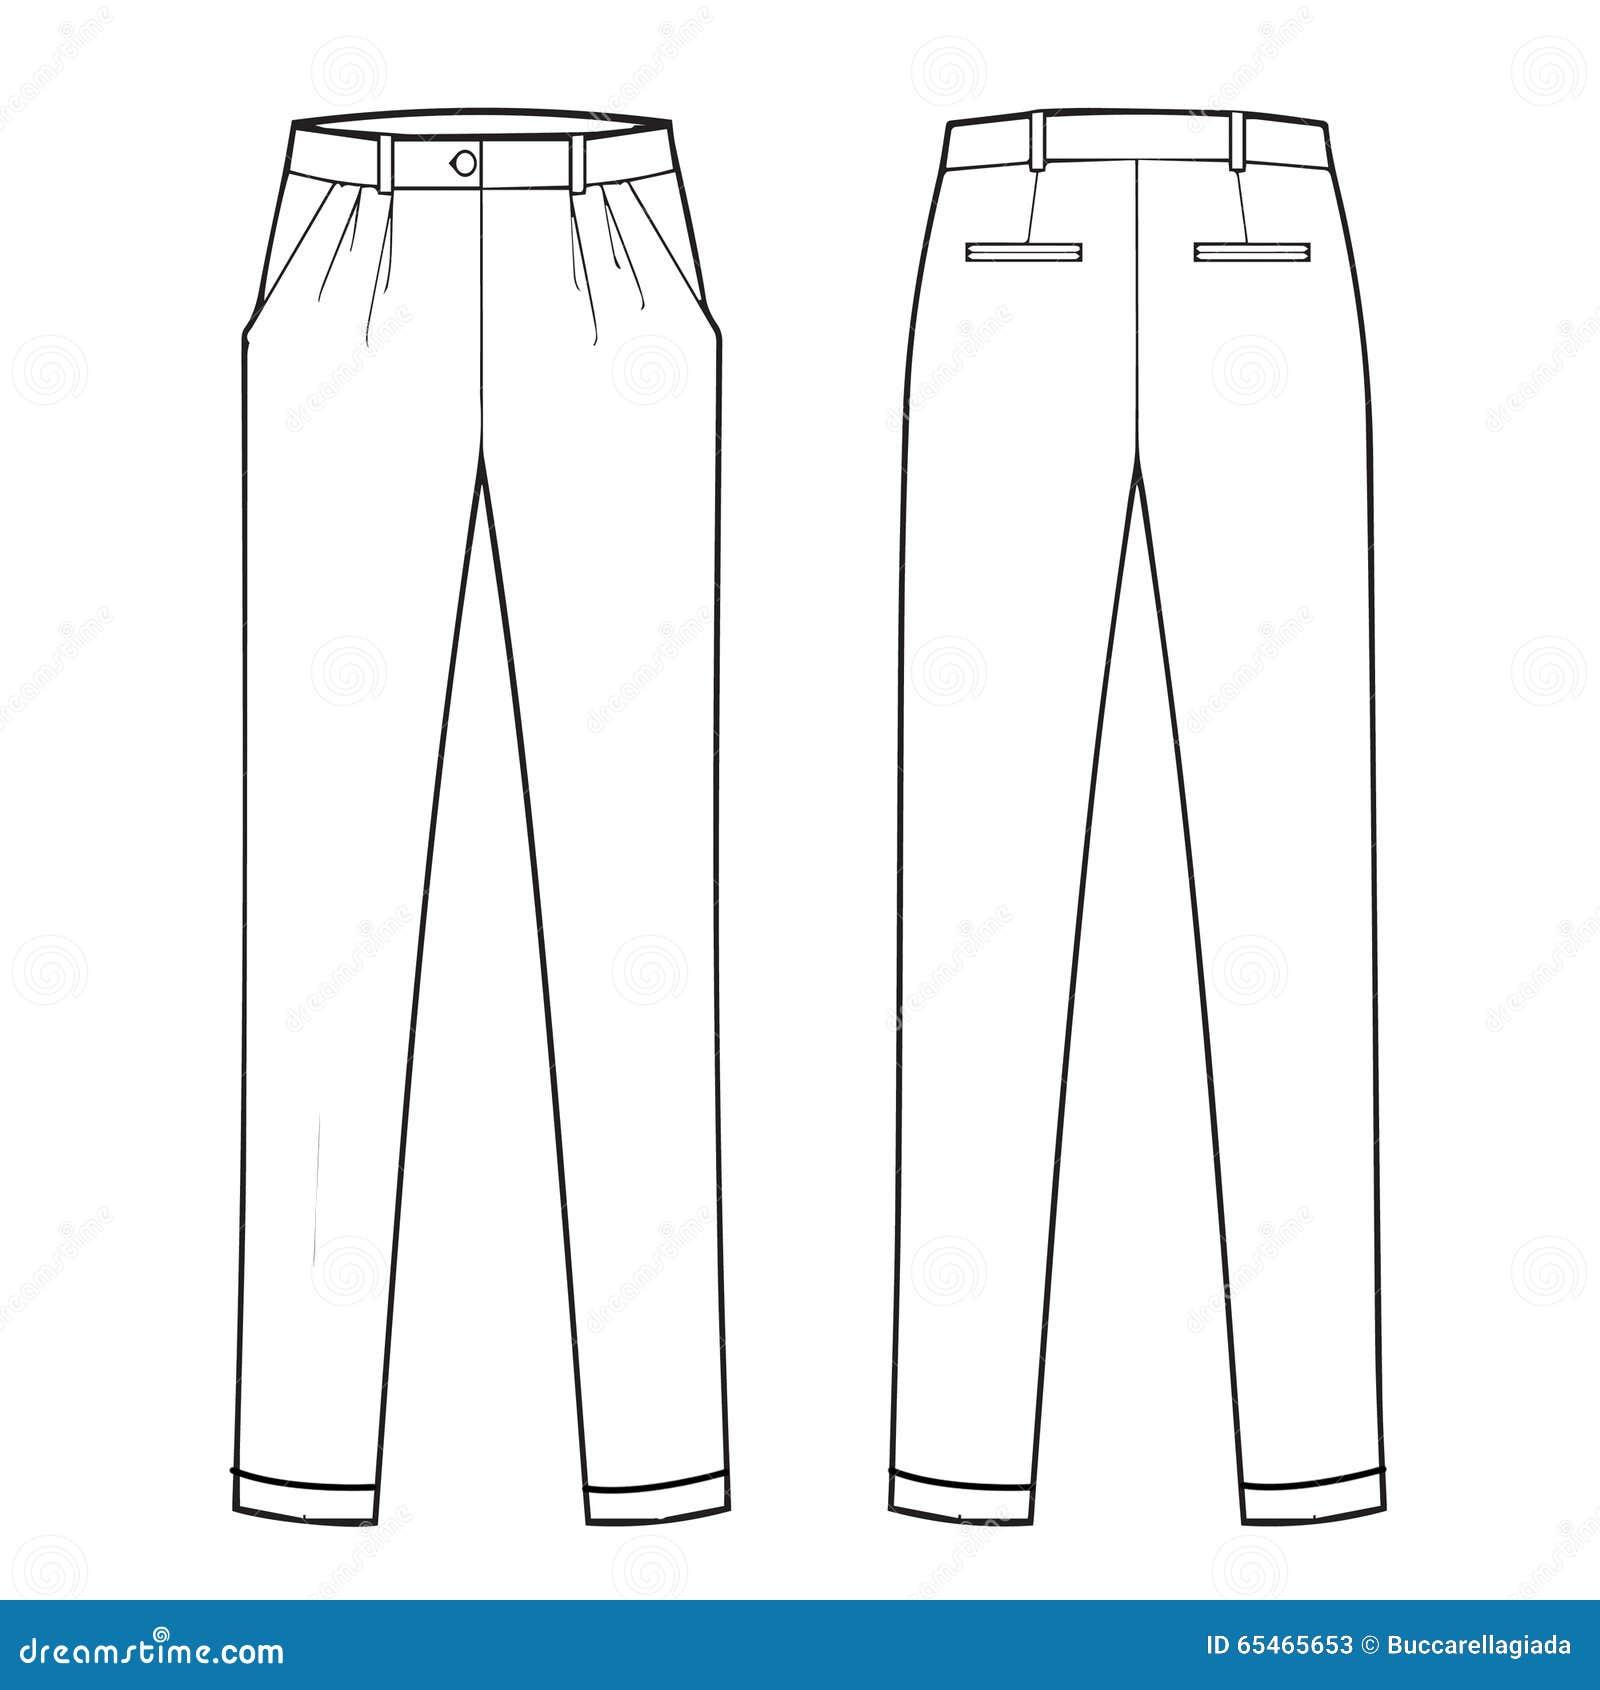 Male fashion sketches.